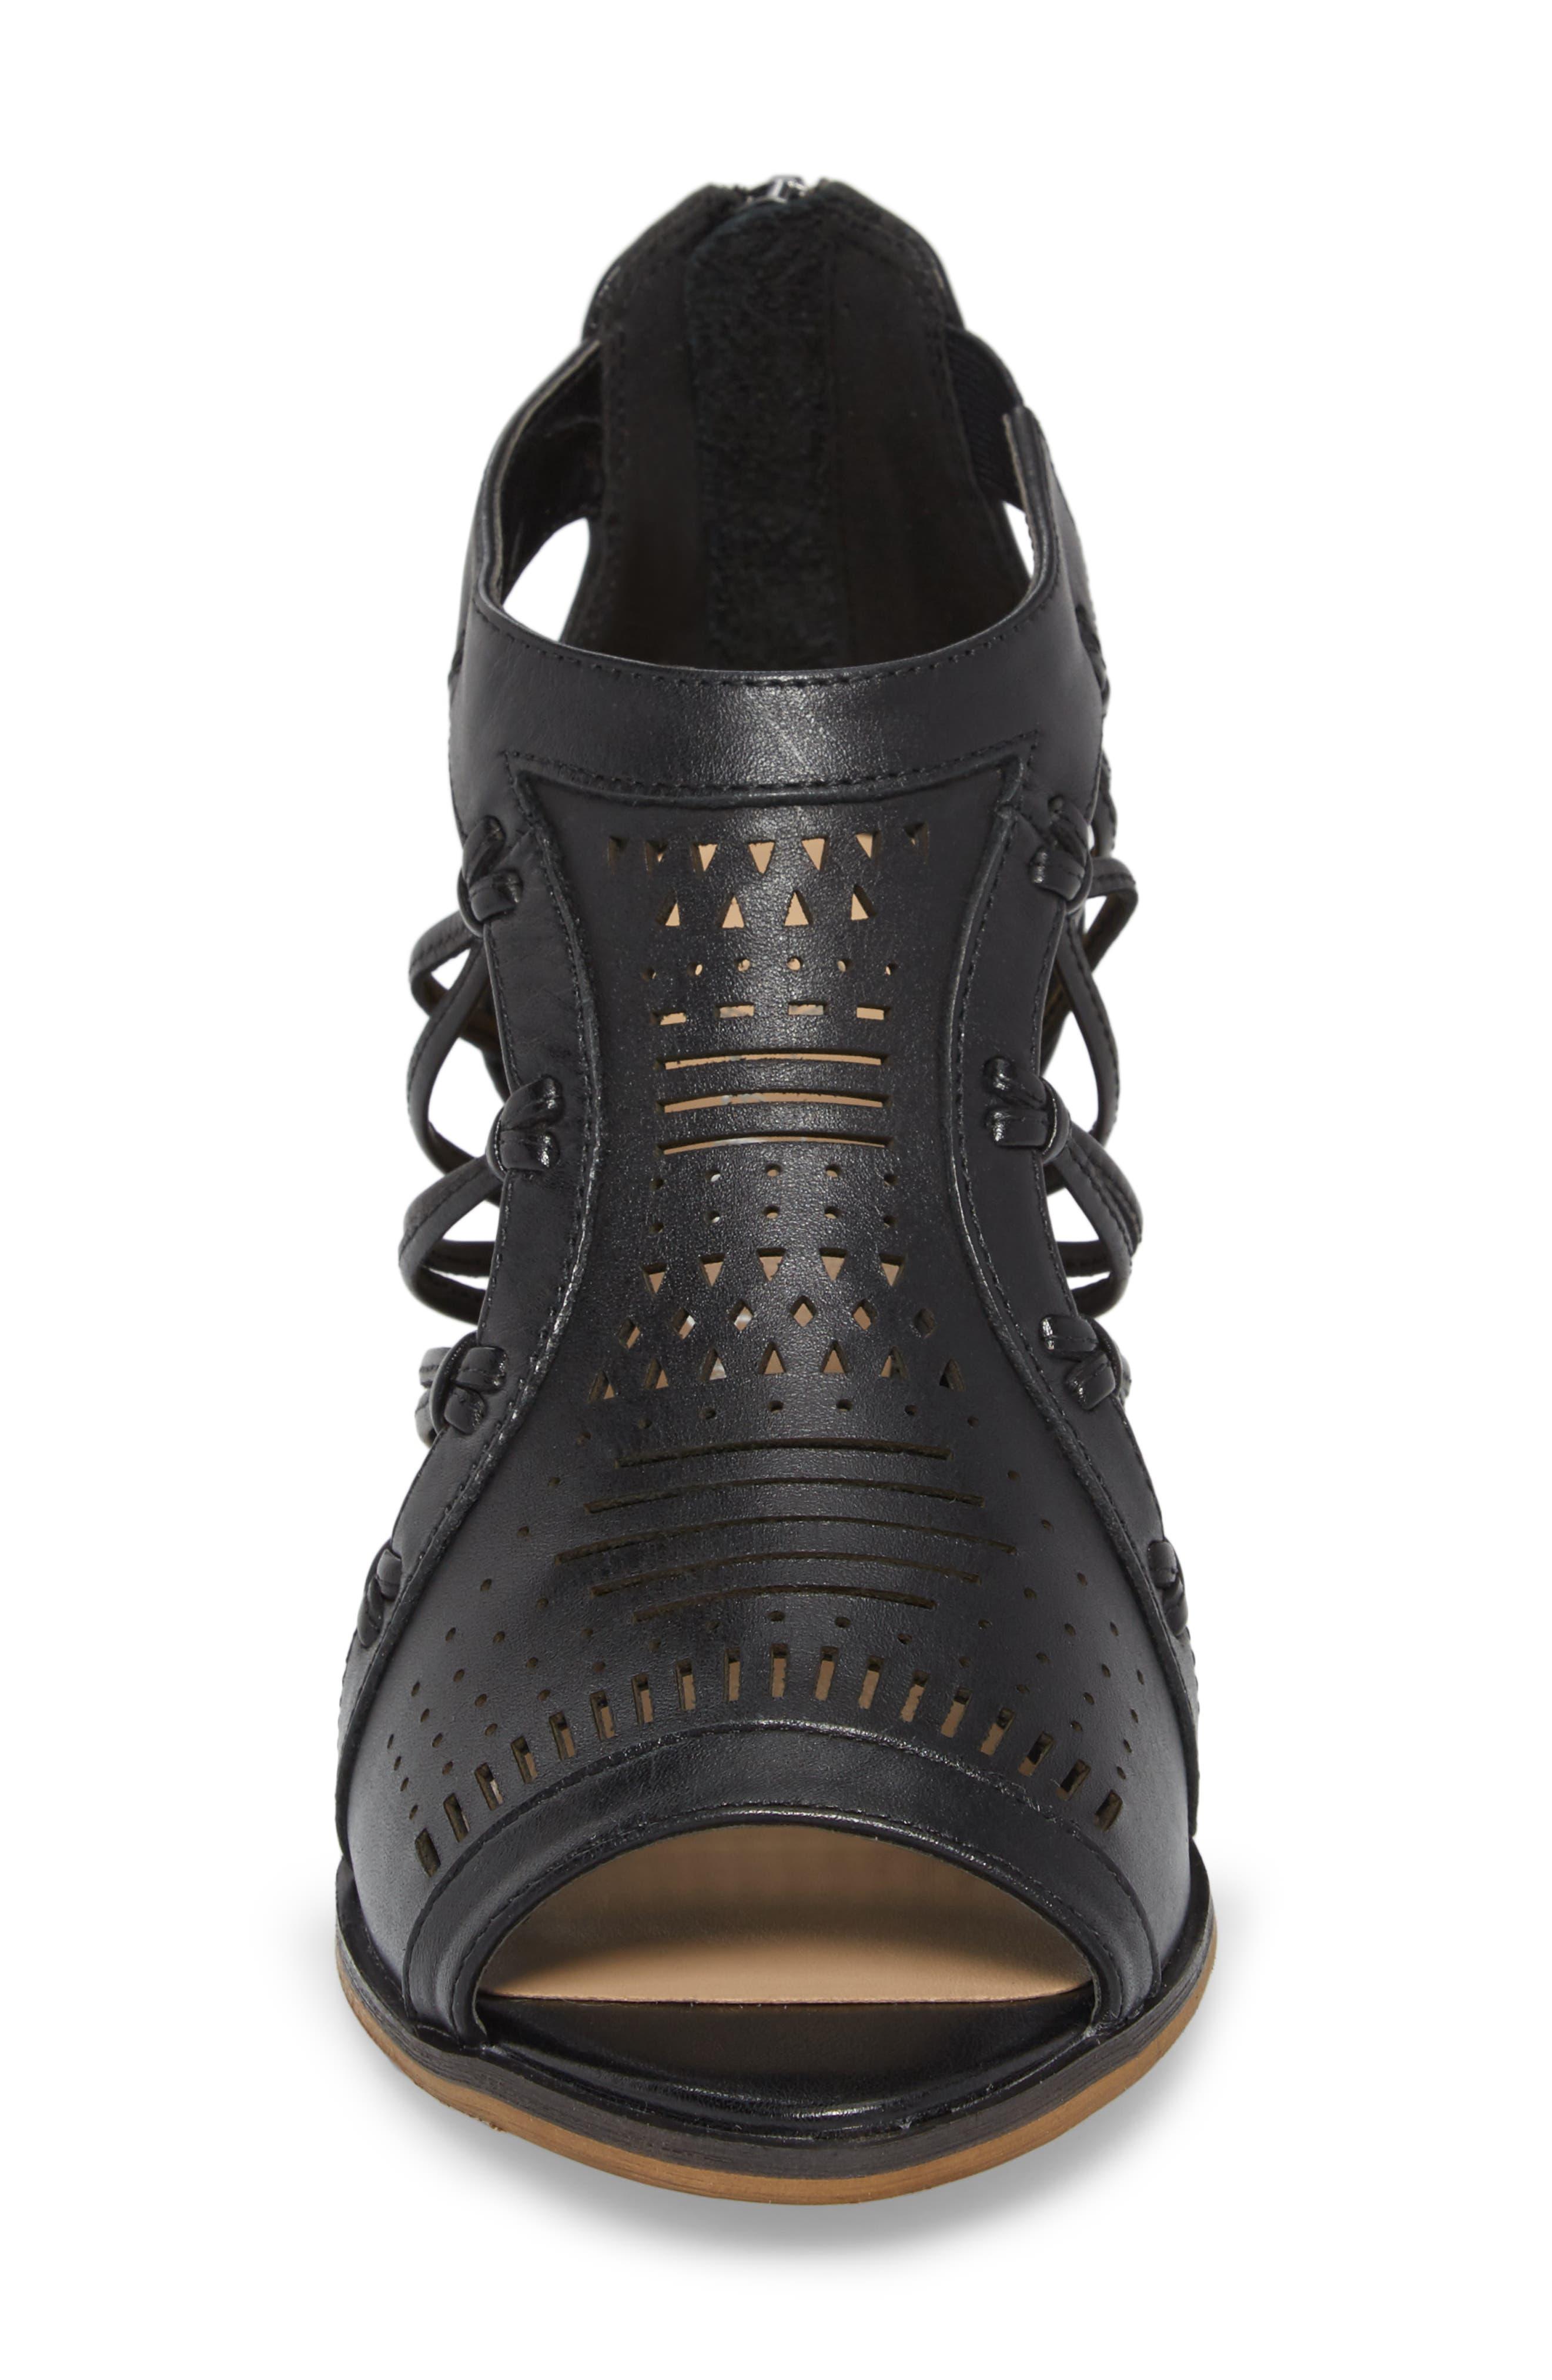 Kortez Block Heel Sandal,                             Alternate thumbnail 4, color,                             BLACK LEATHER